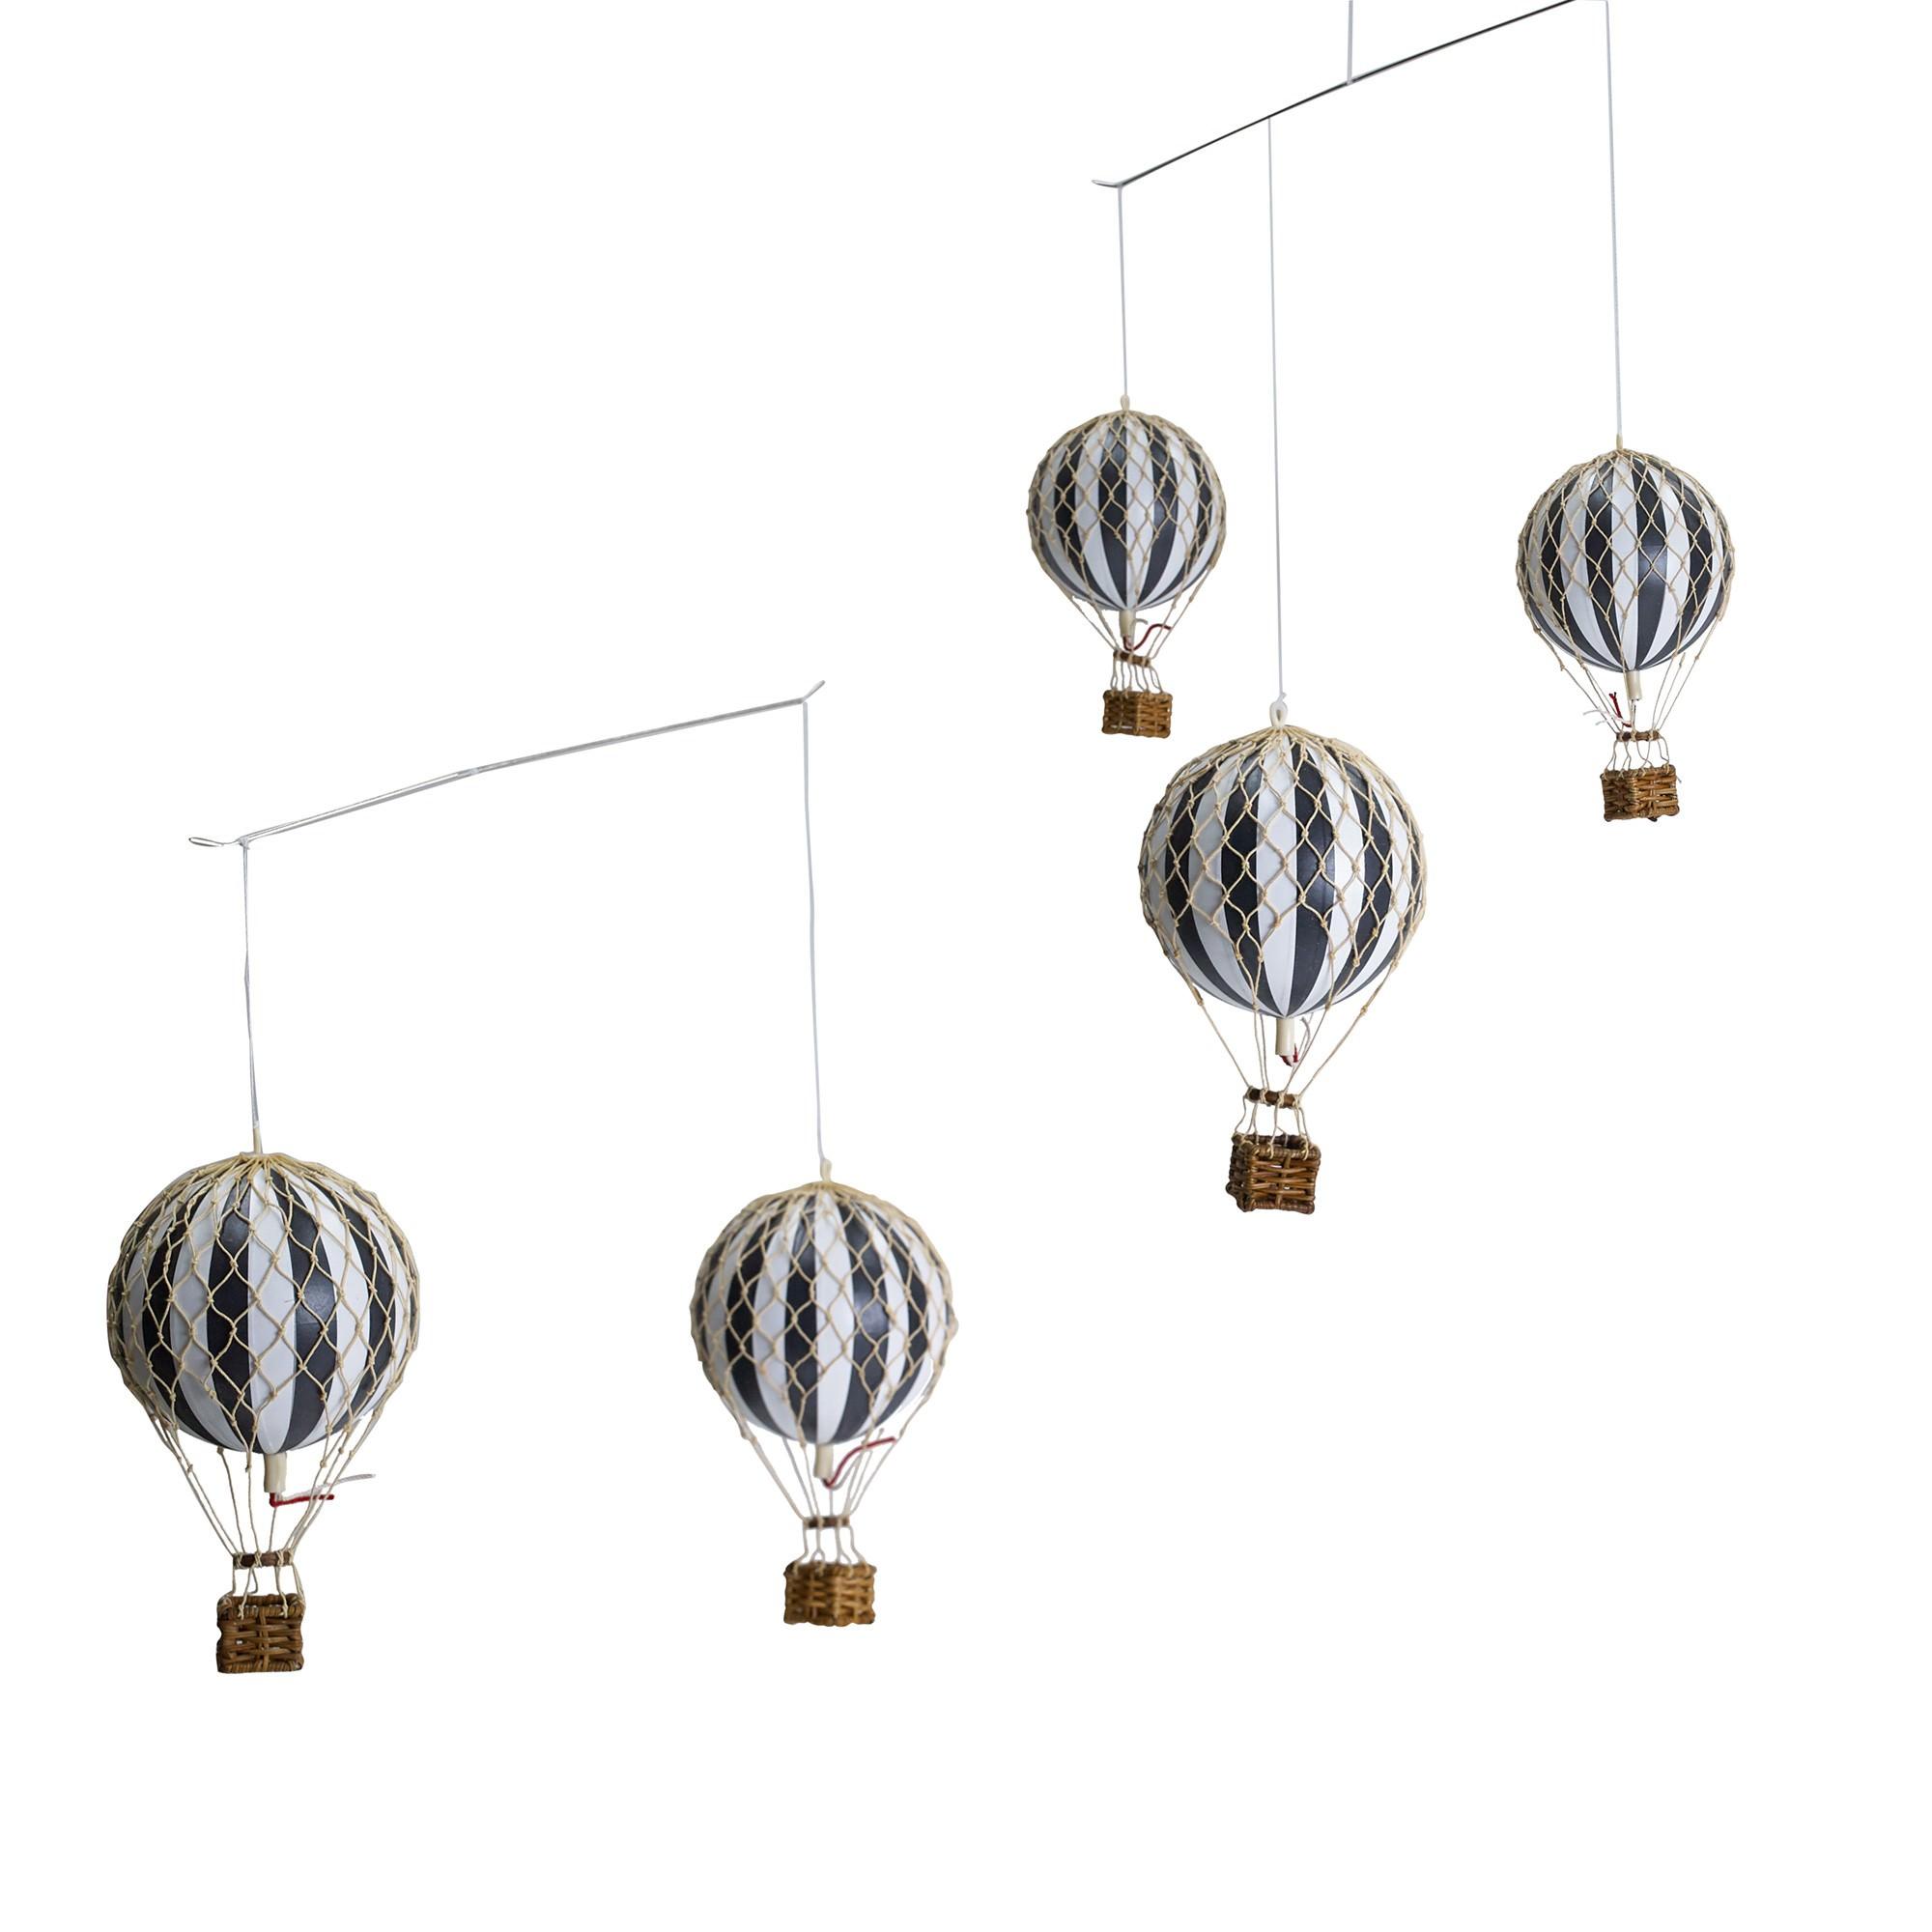 Flying The Skies Balloon Mobile Decor, Black / White